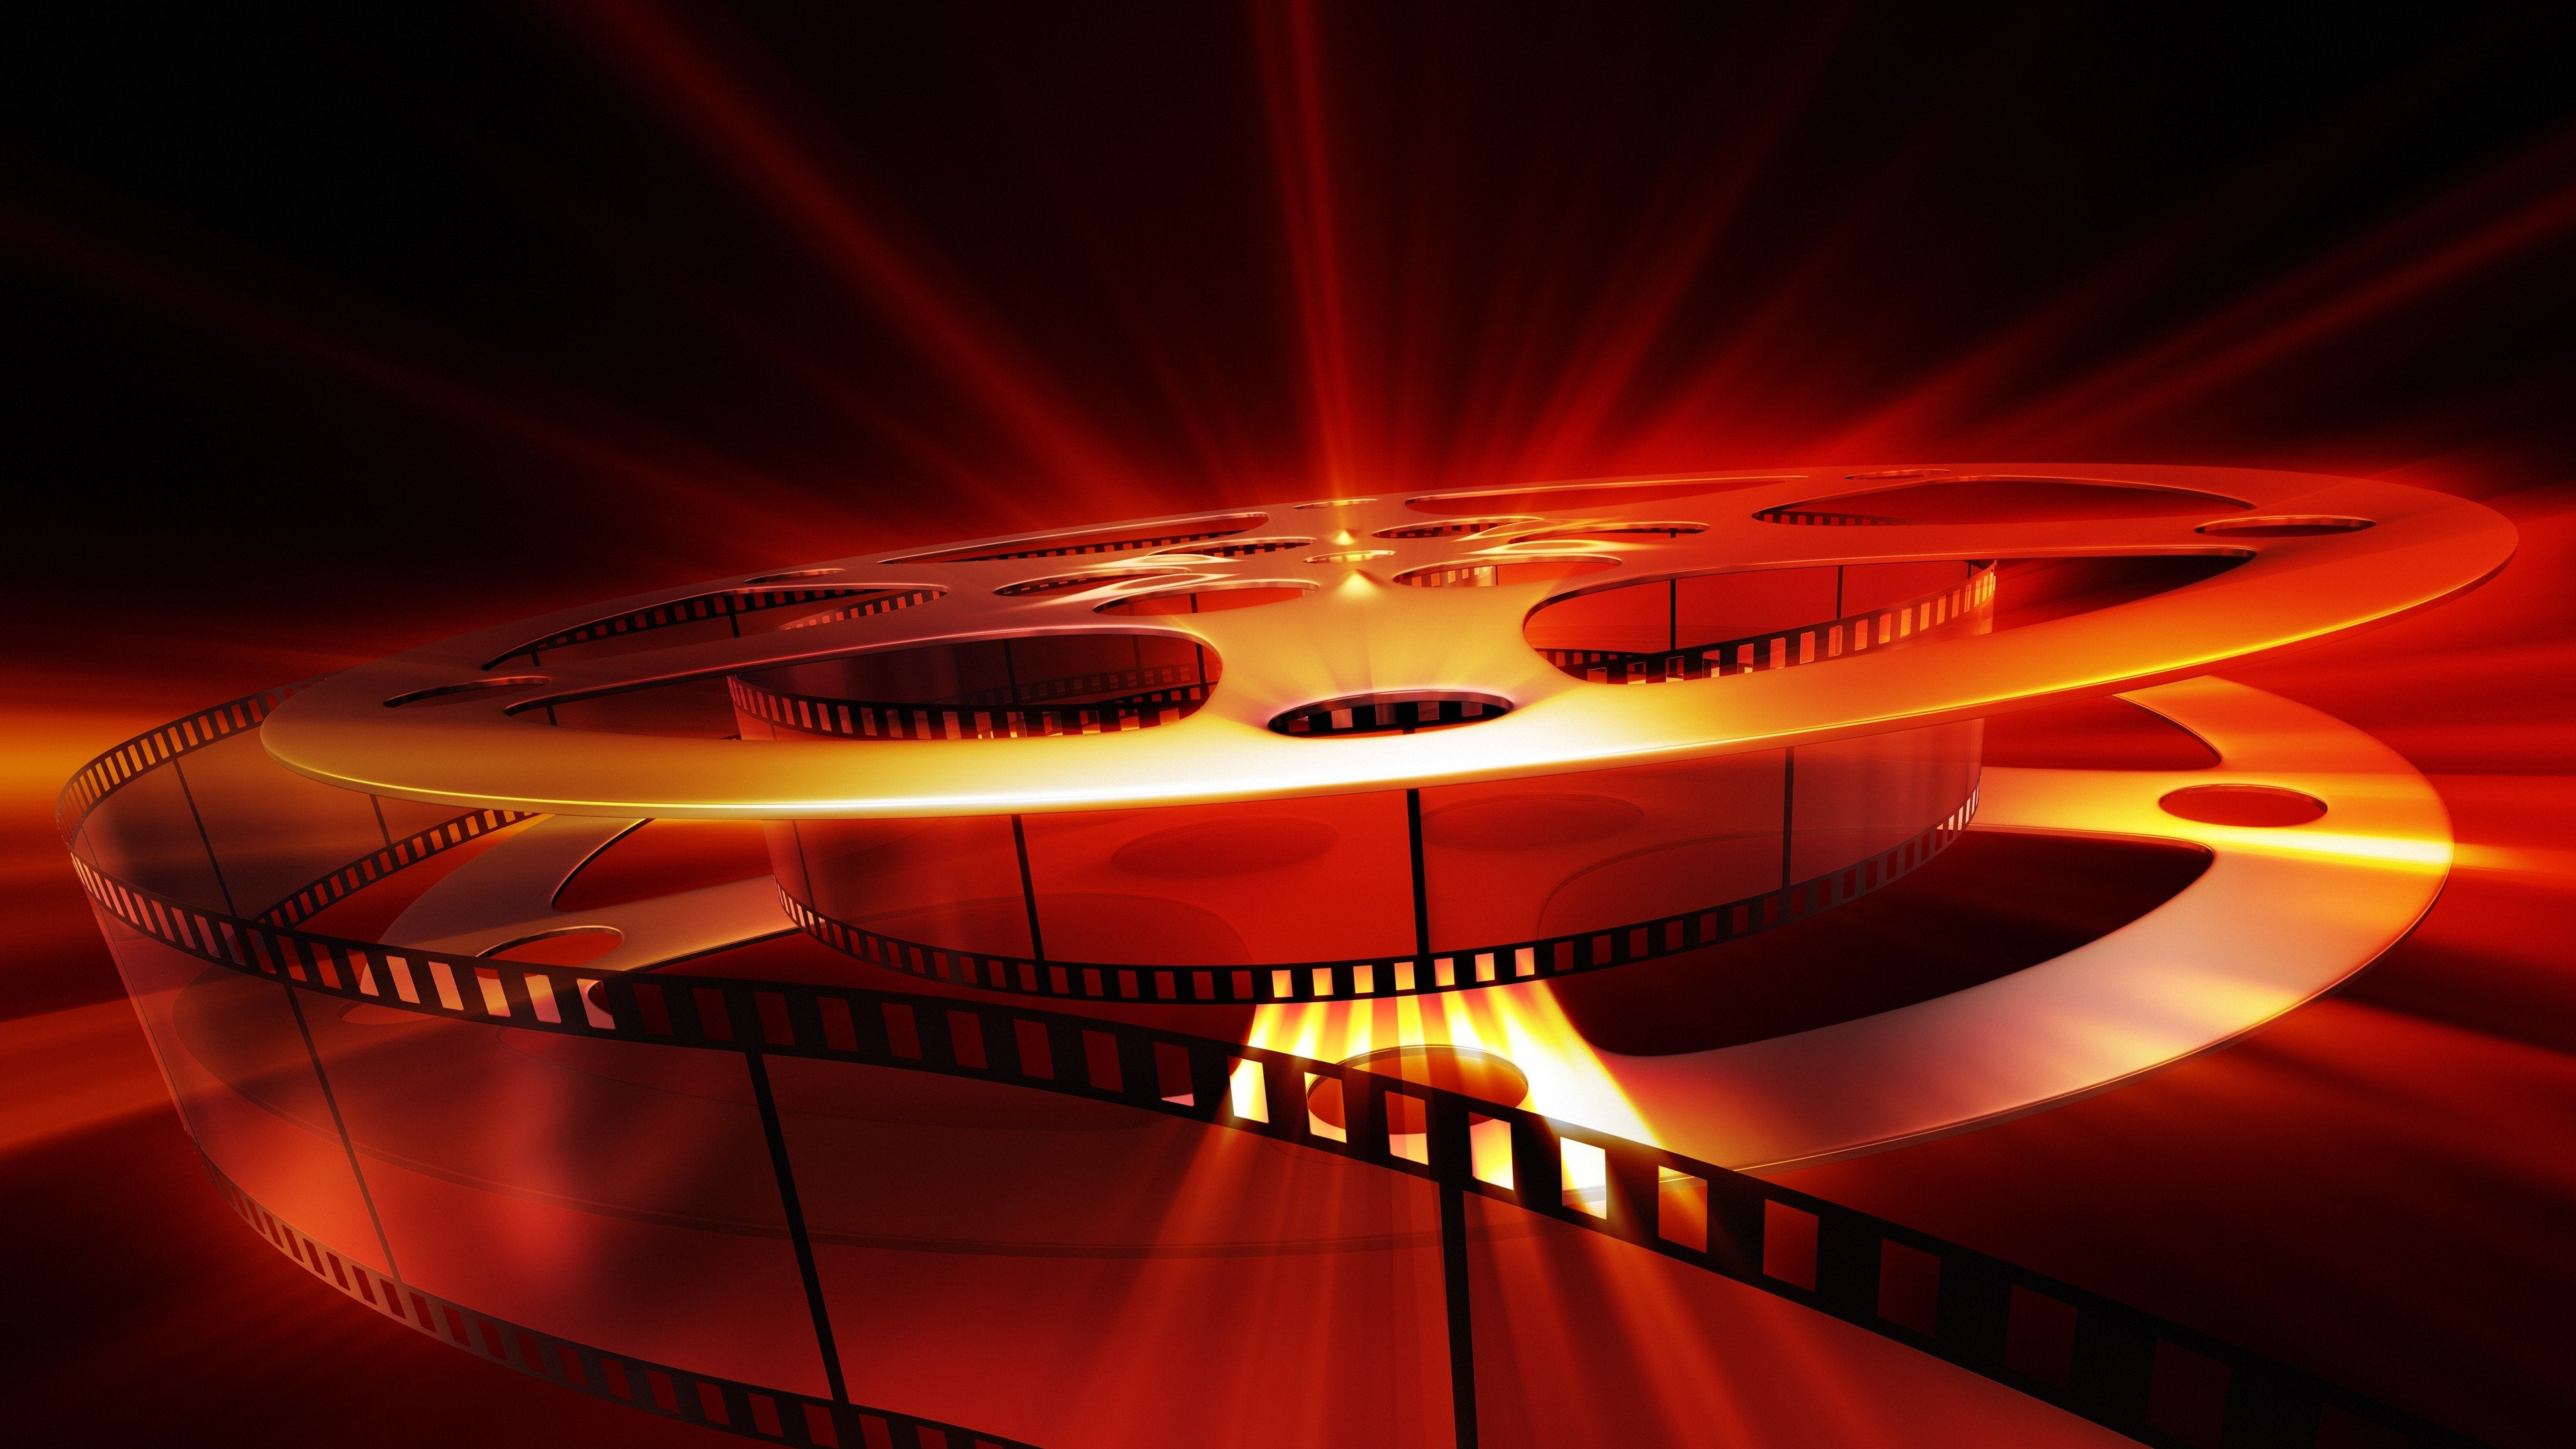 BET Star Cinema